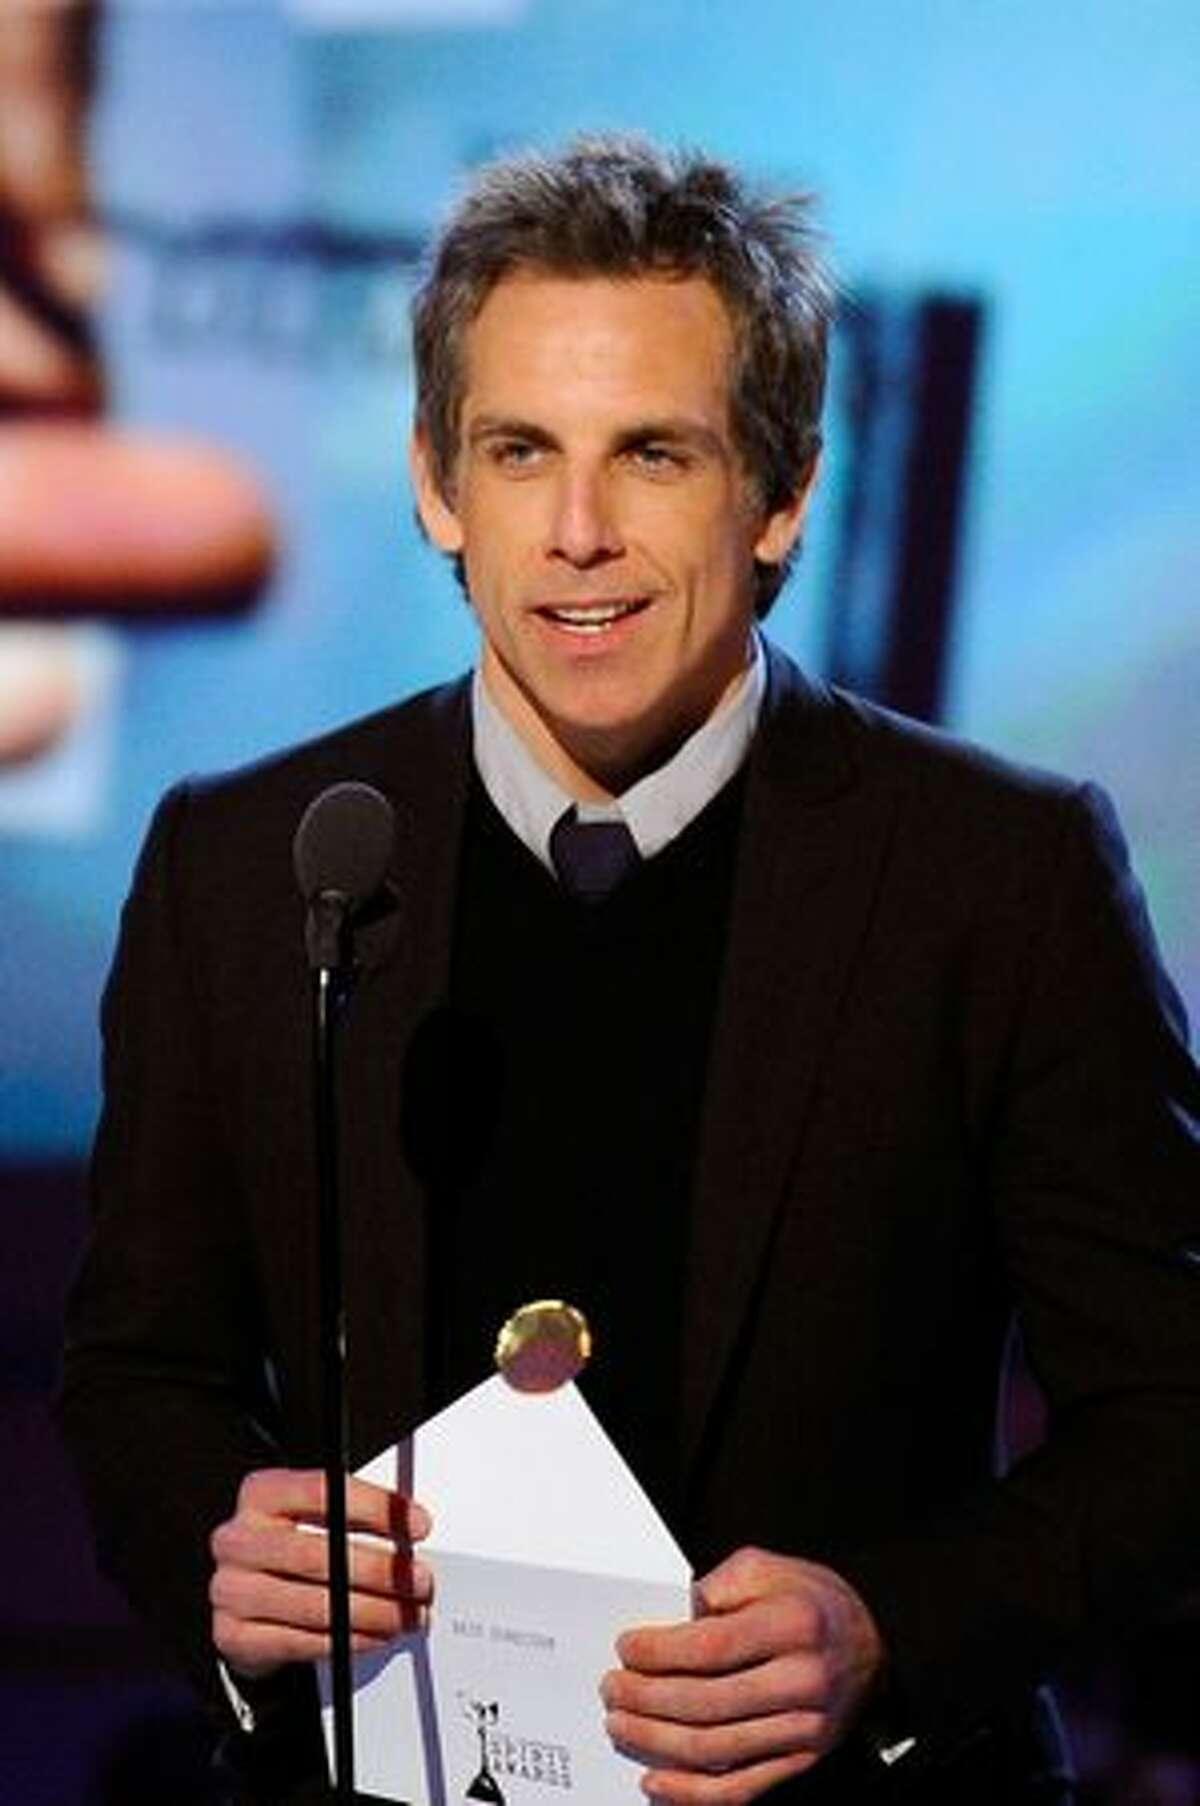 Actor Ben Stiller presents onstage.